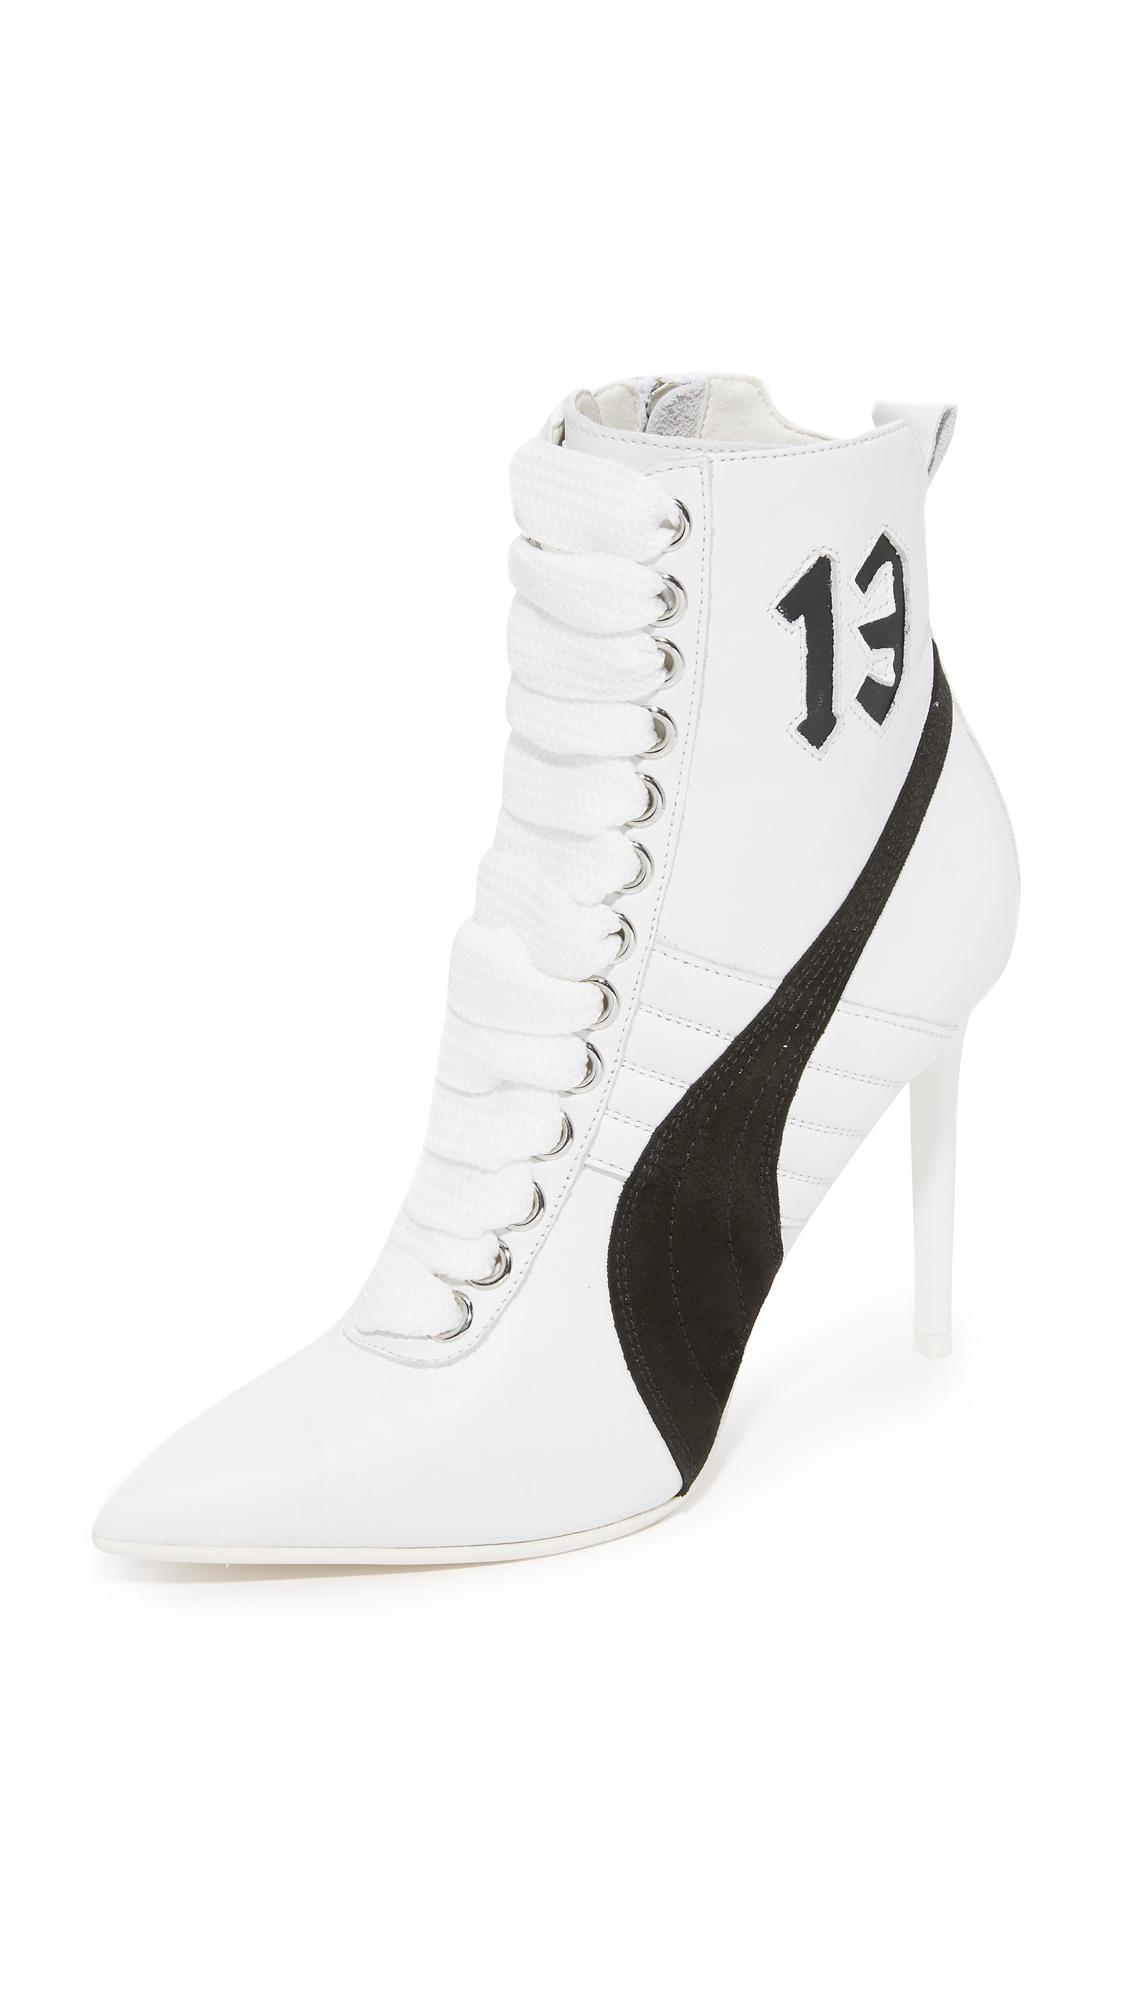 Puma Puma X Rihanna Sneaker Booties - White